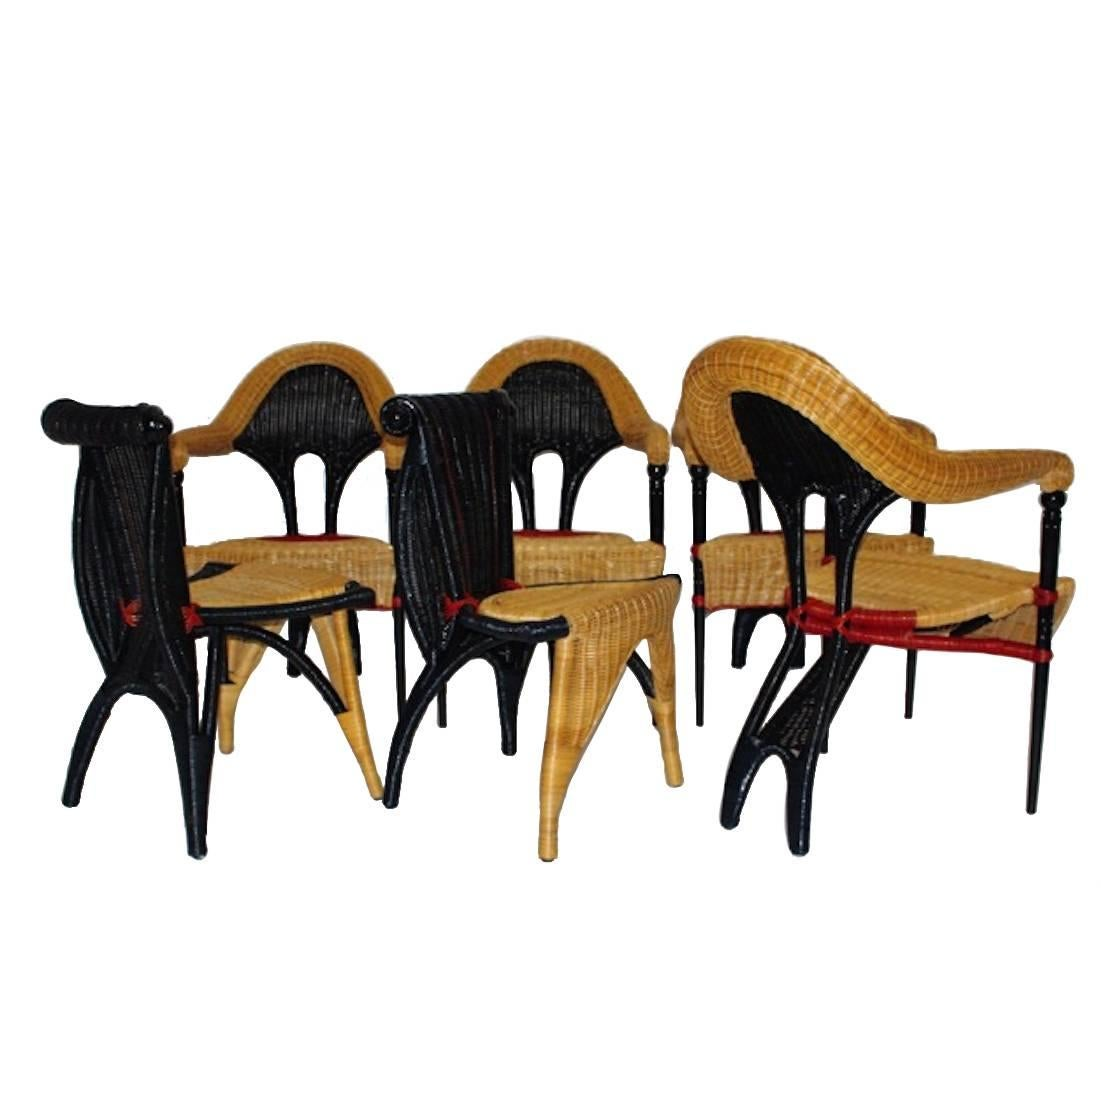 Postmodern Vintage Rattan Six Dining Chairs by Borek Sipek Czech Republic 1988